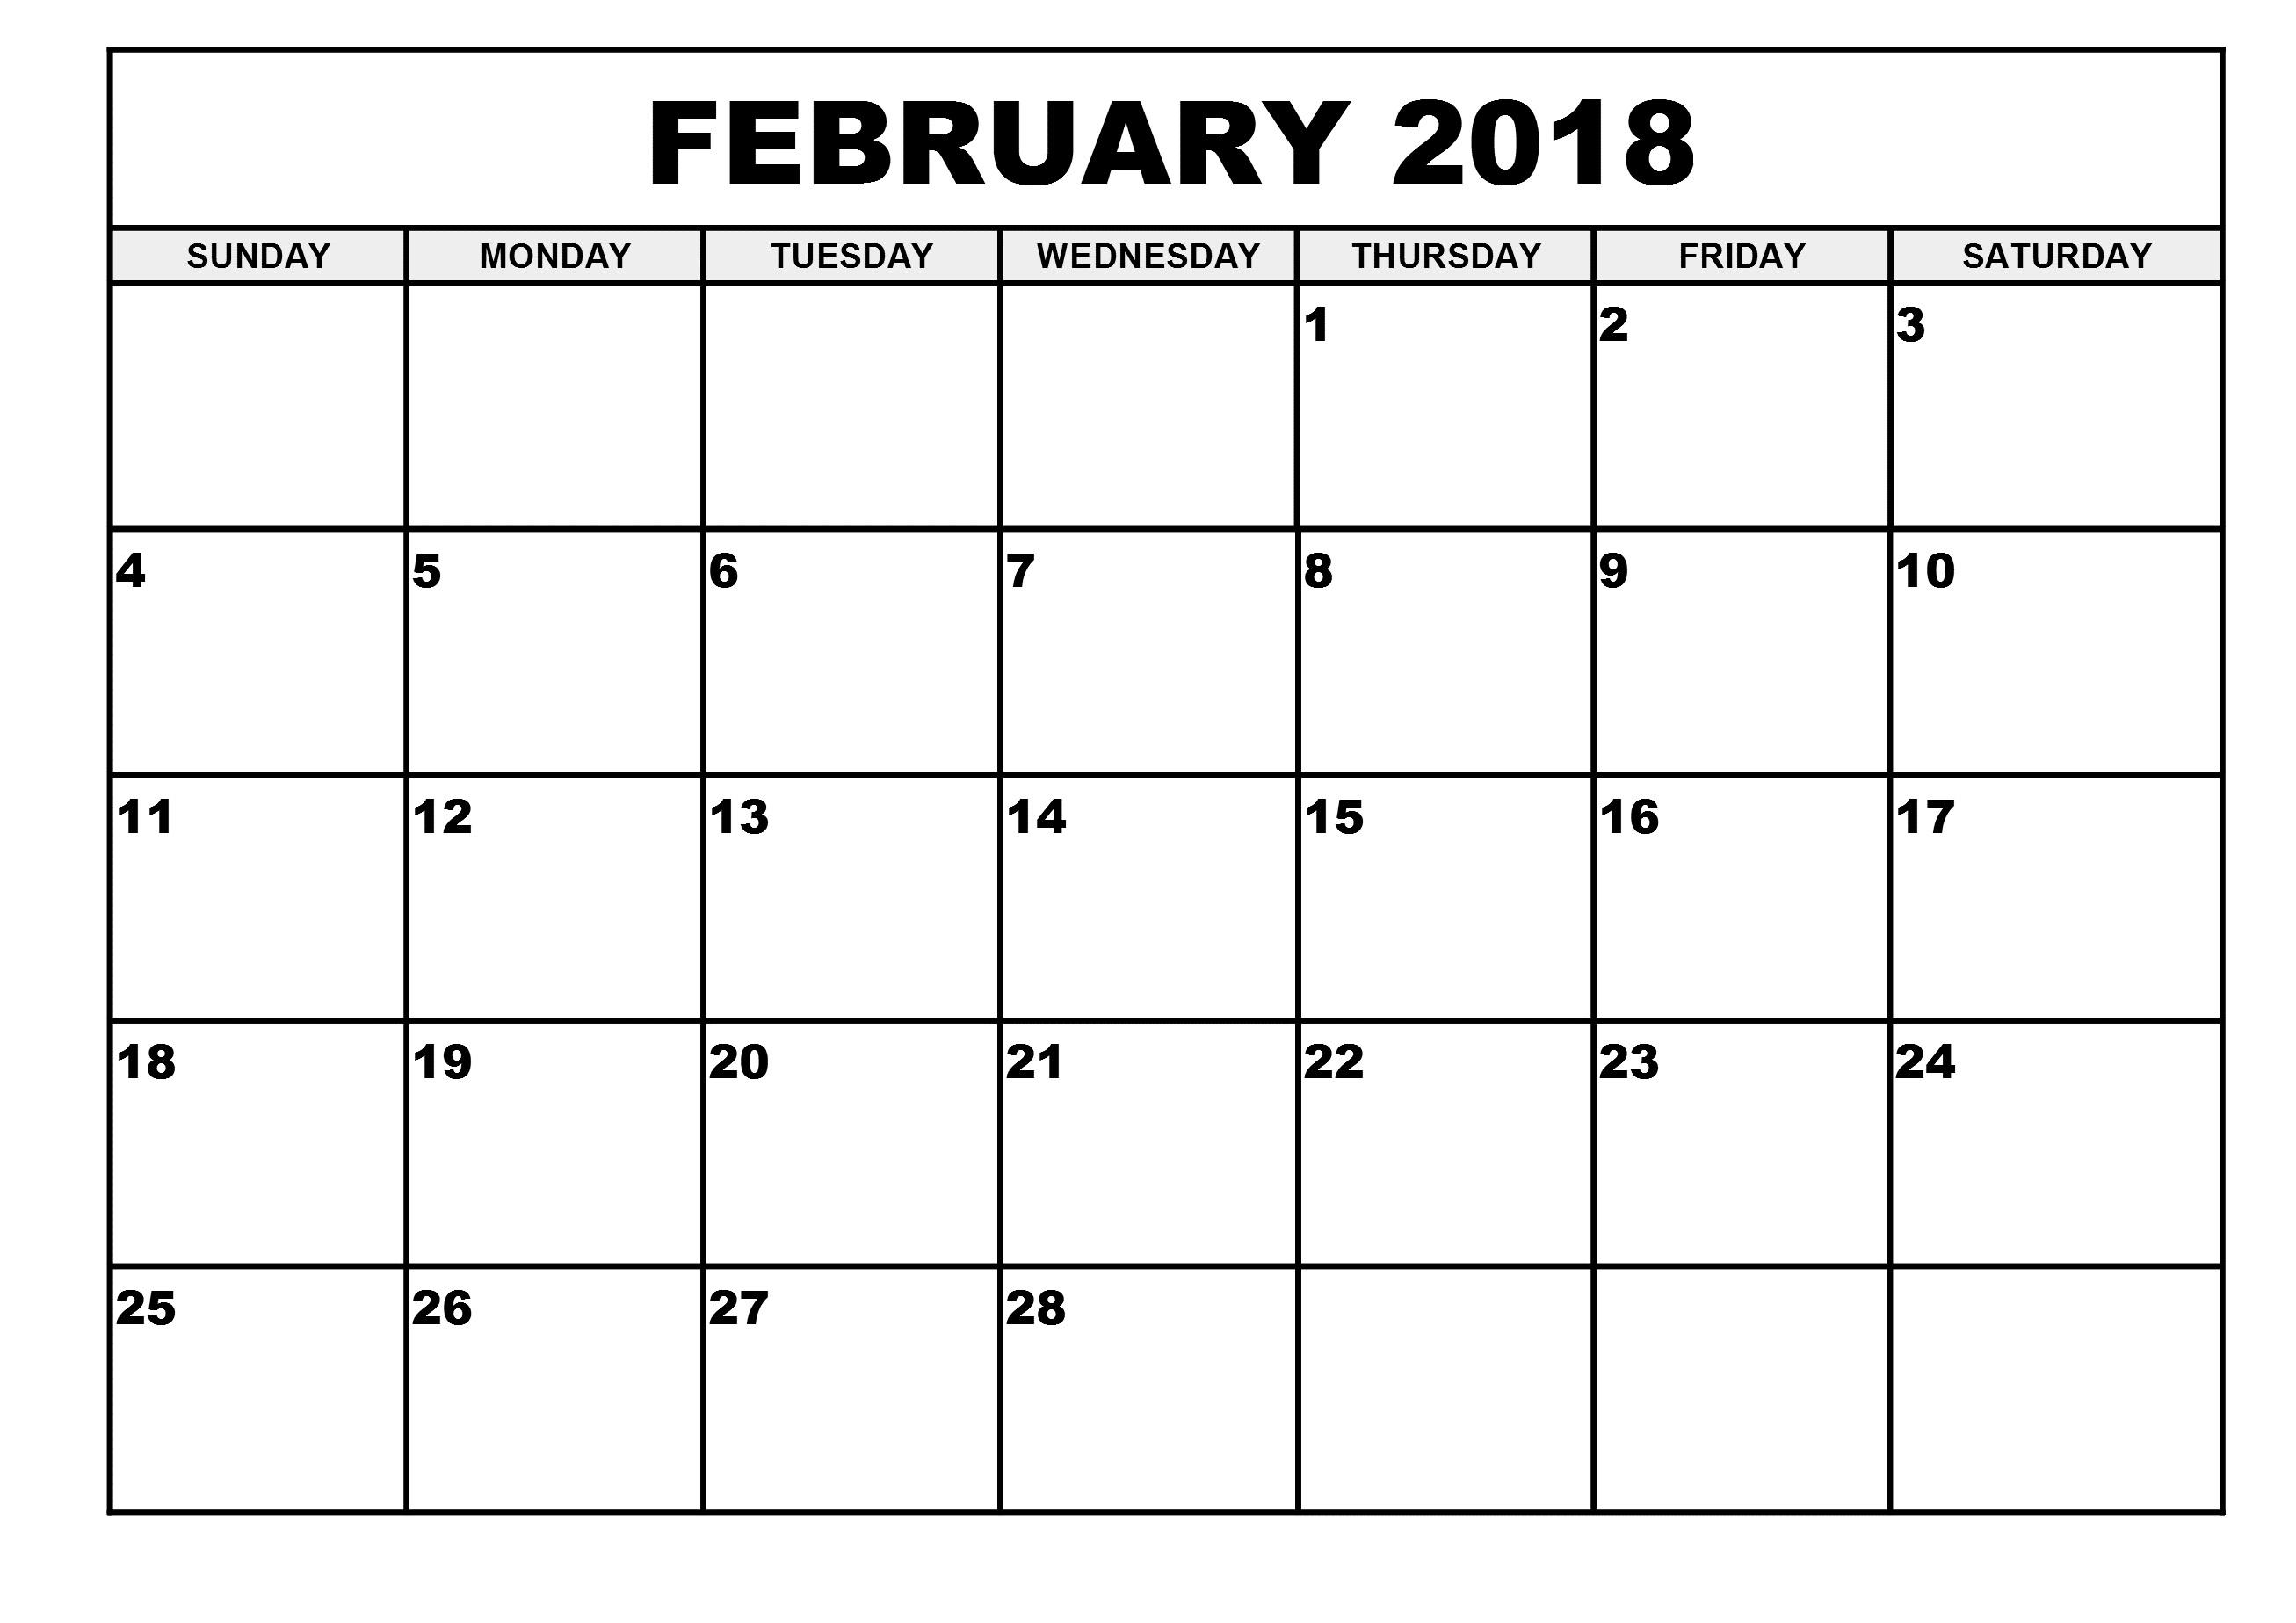 February 2018 Blank Printable Calendar February 2018 Calendar inside Full Size Blank Printable Calendar